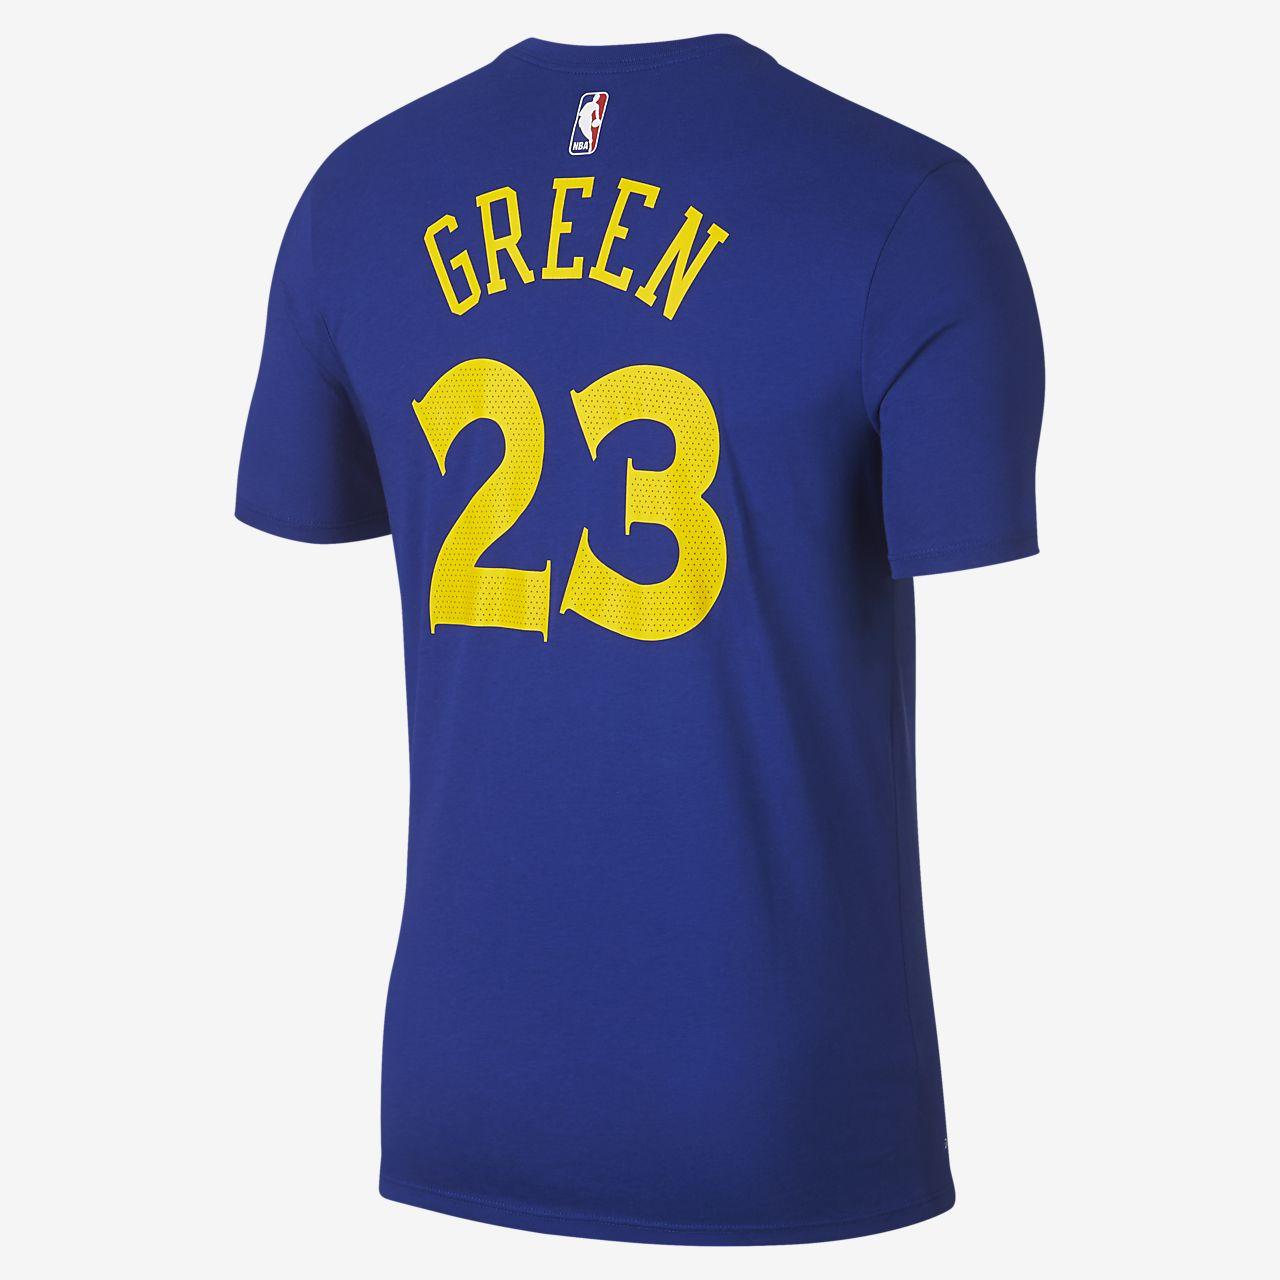 Nike Golden State Warriors 2018 2019 men's sweatshirt · Nike